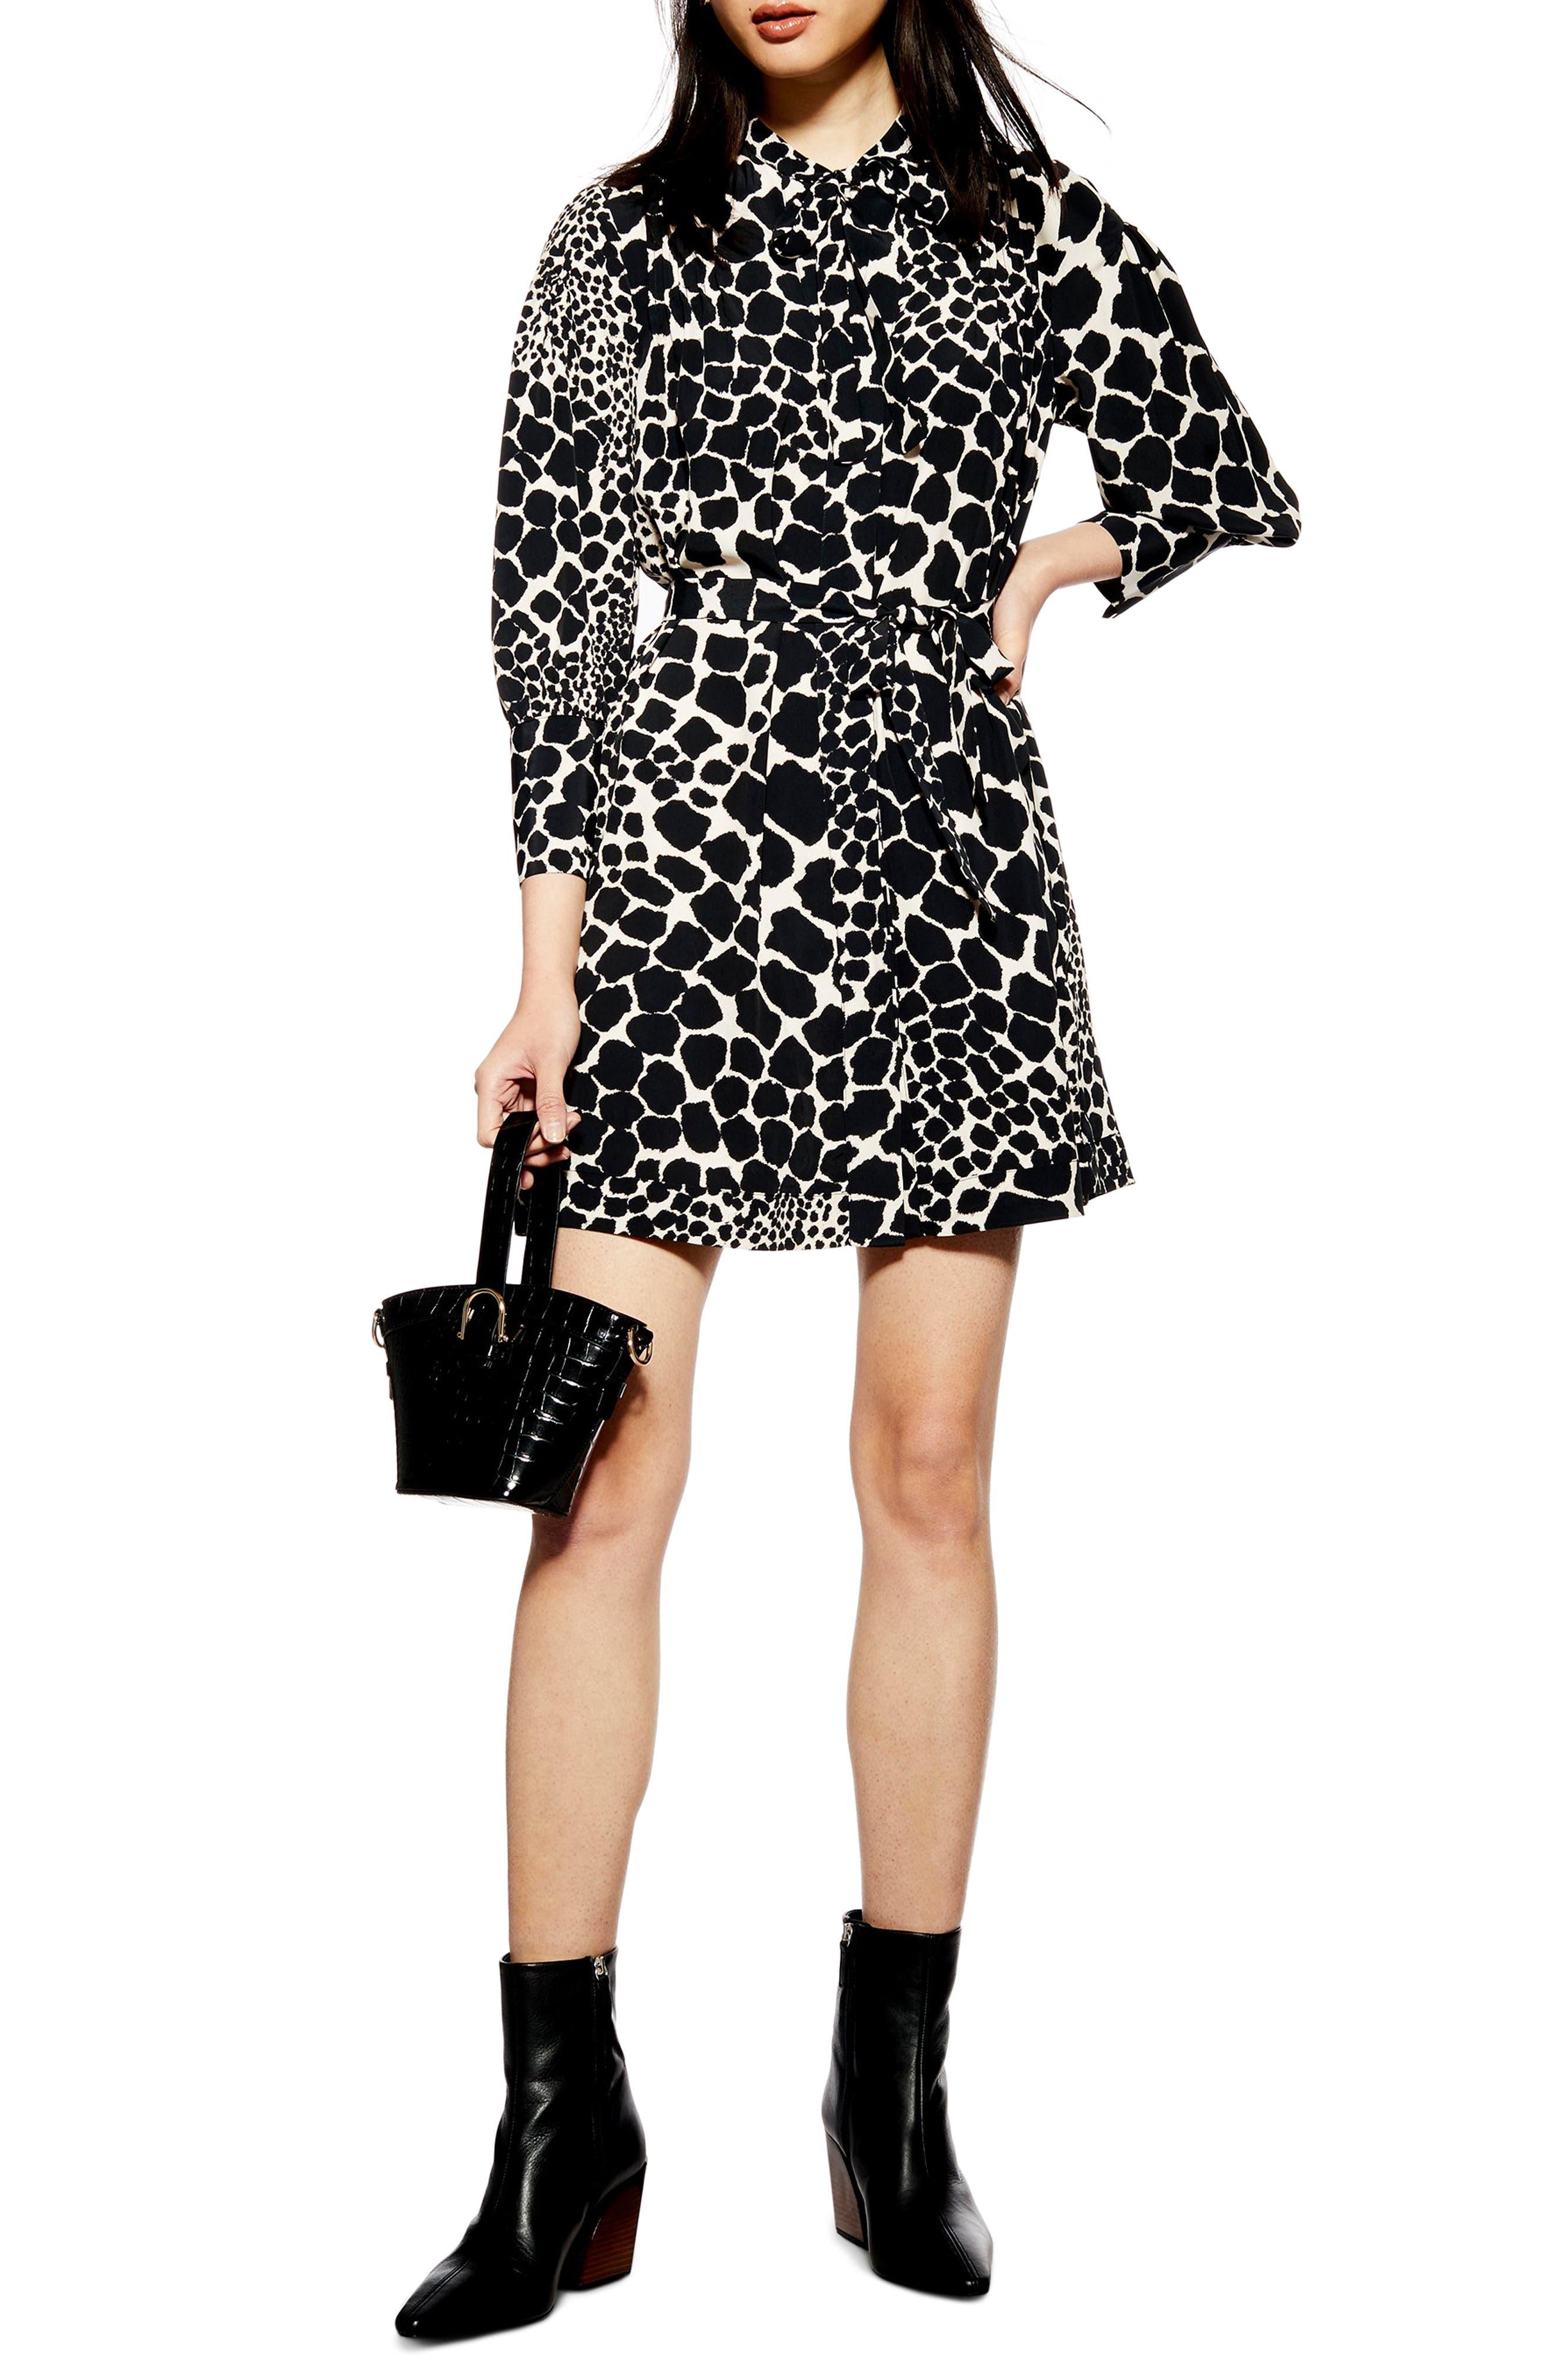 Petite Topshop Giraffe Print Minidress, P US (fits like 14P) - Black